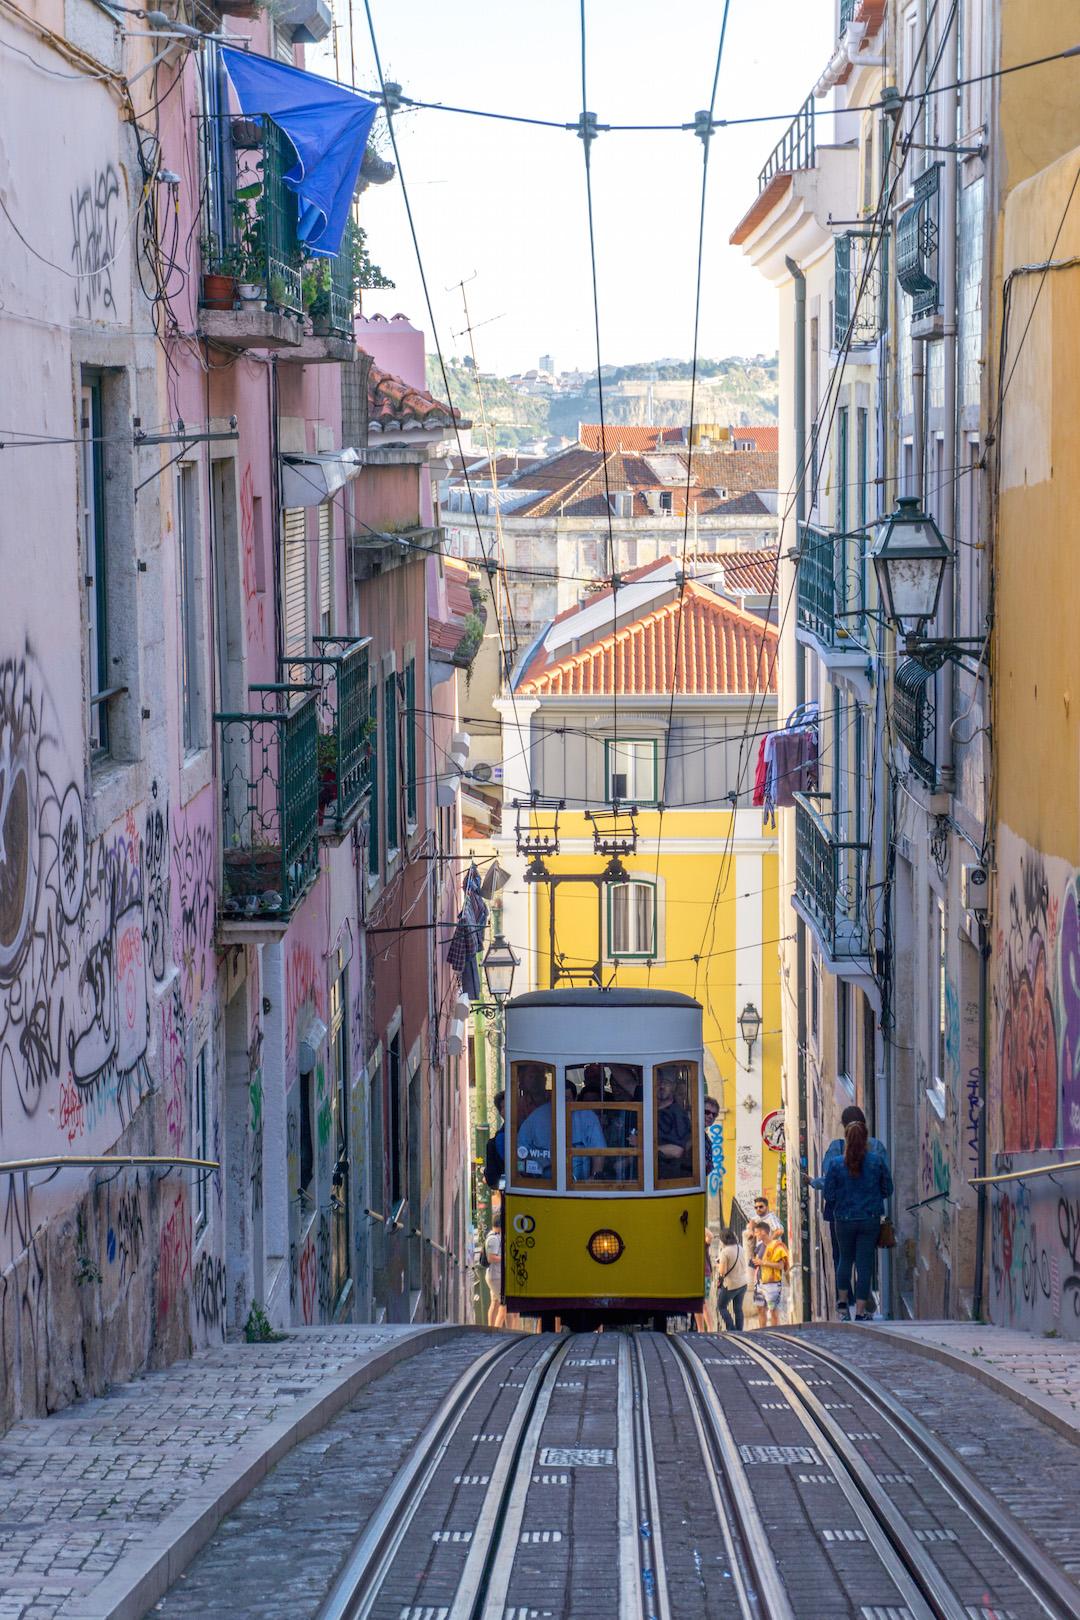 Her_Travel_Edit_Lisbon_Tram